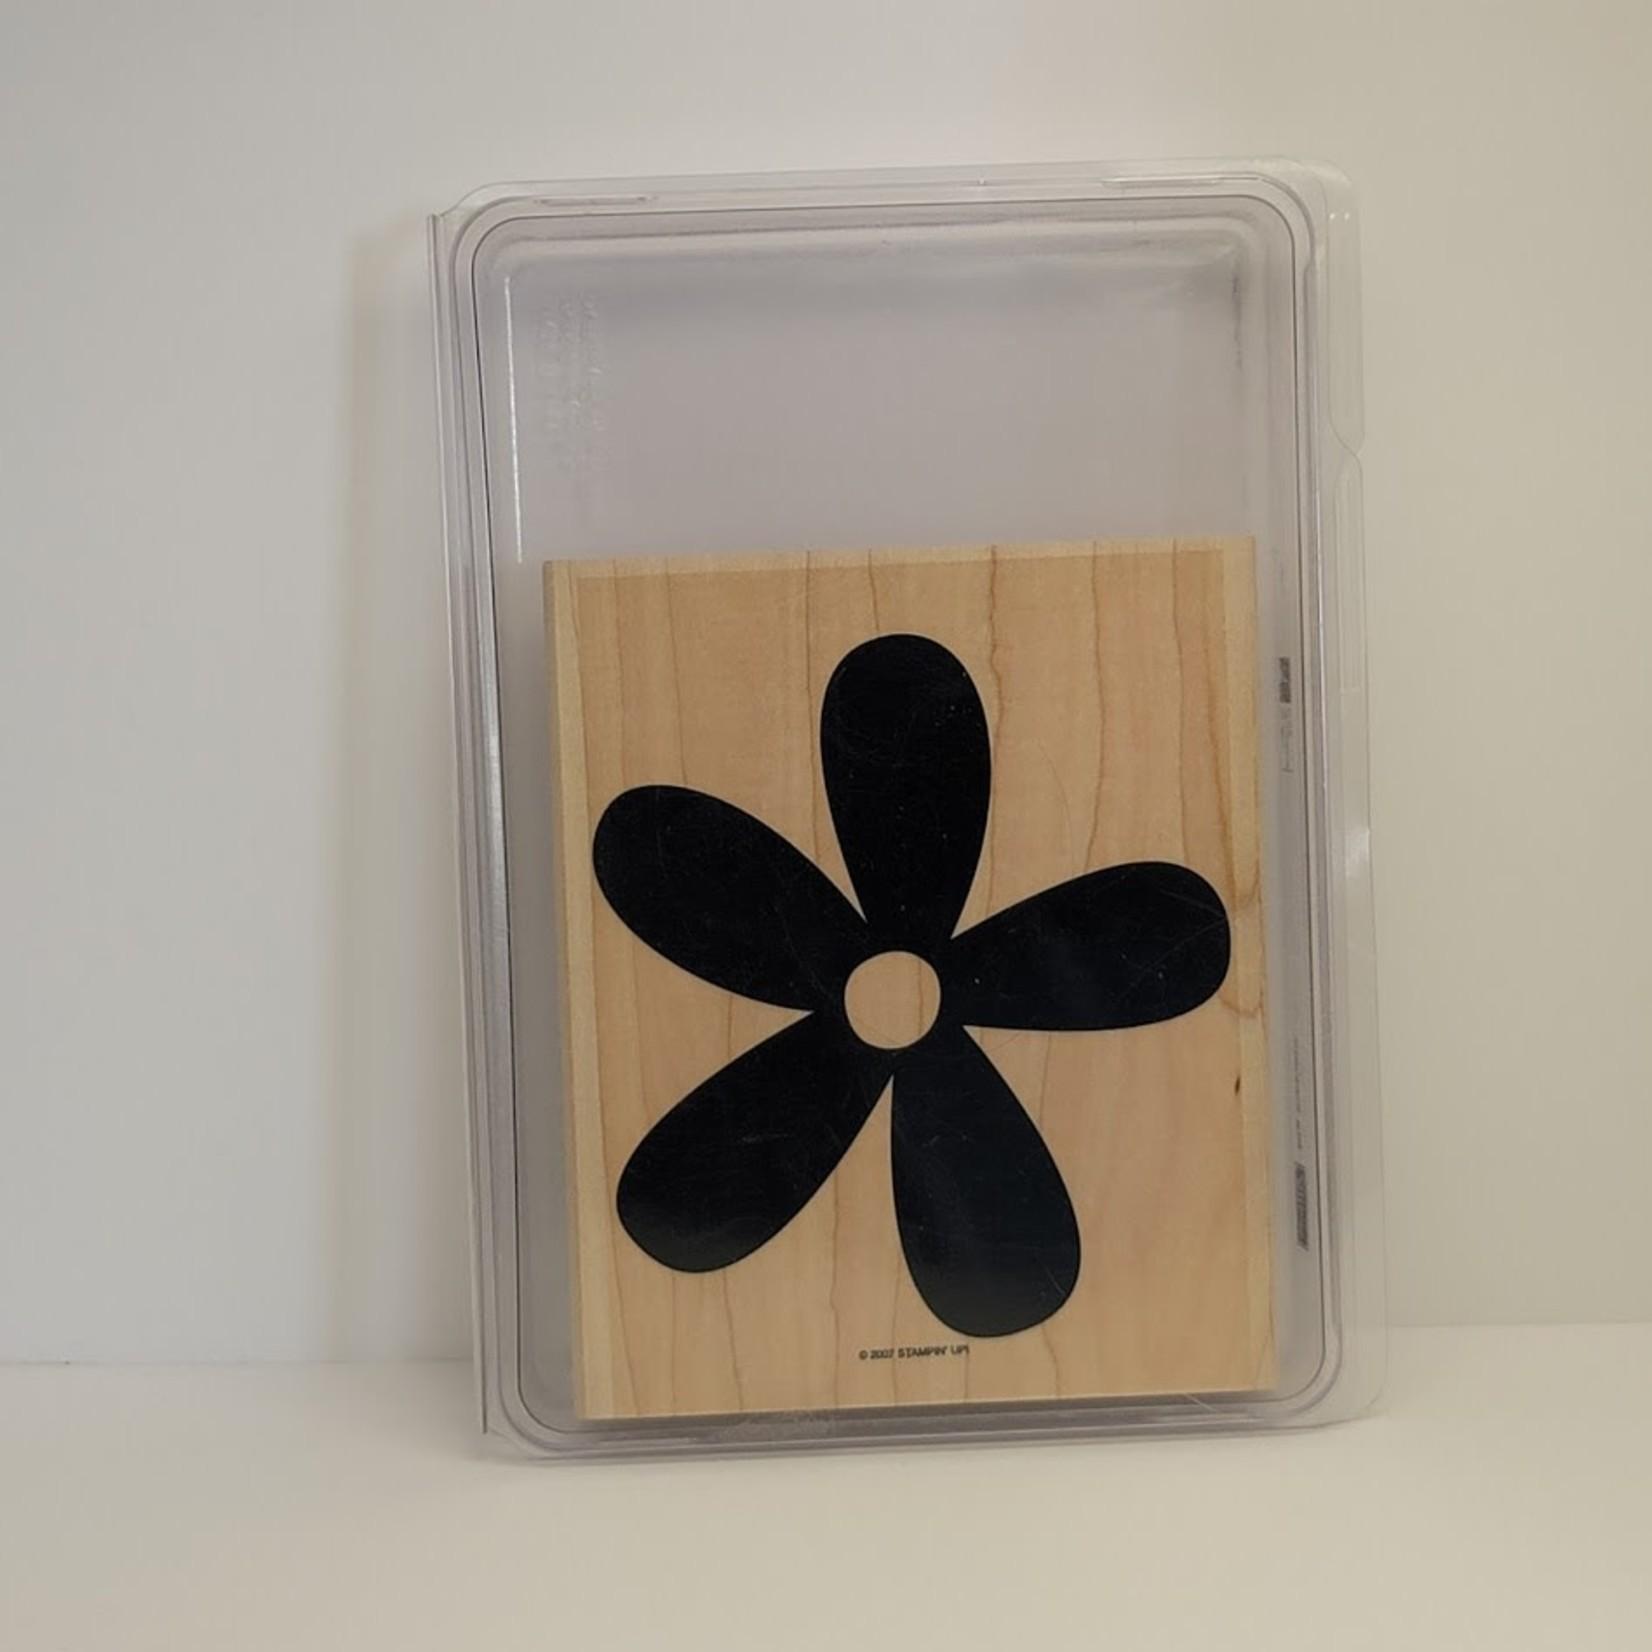 Stampin' Up Stampin' Up - Wooden Stamp - Big Blossom